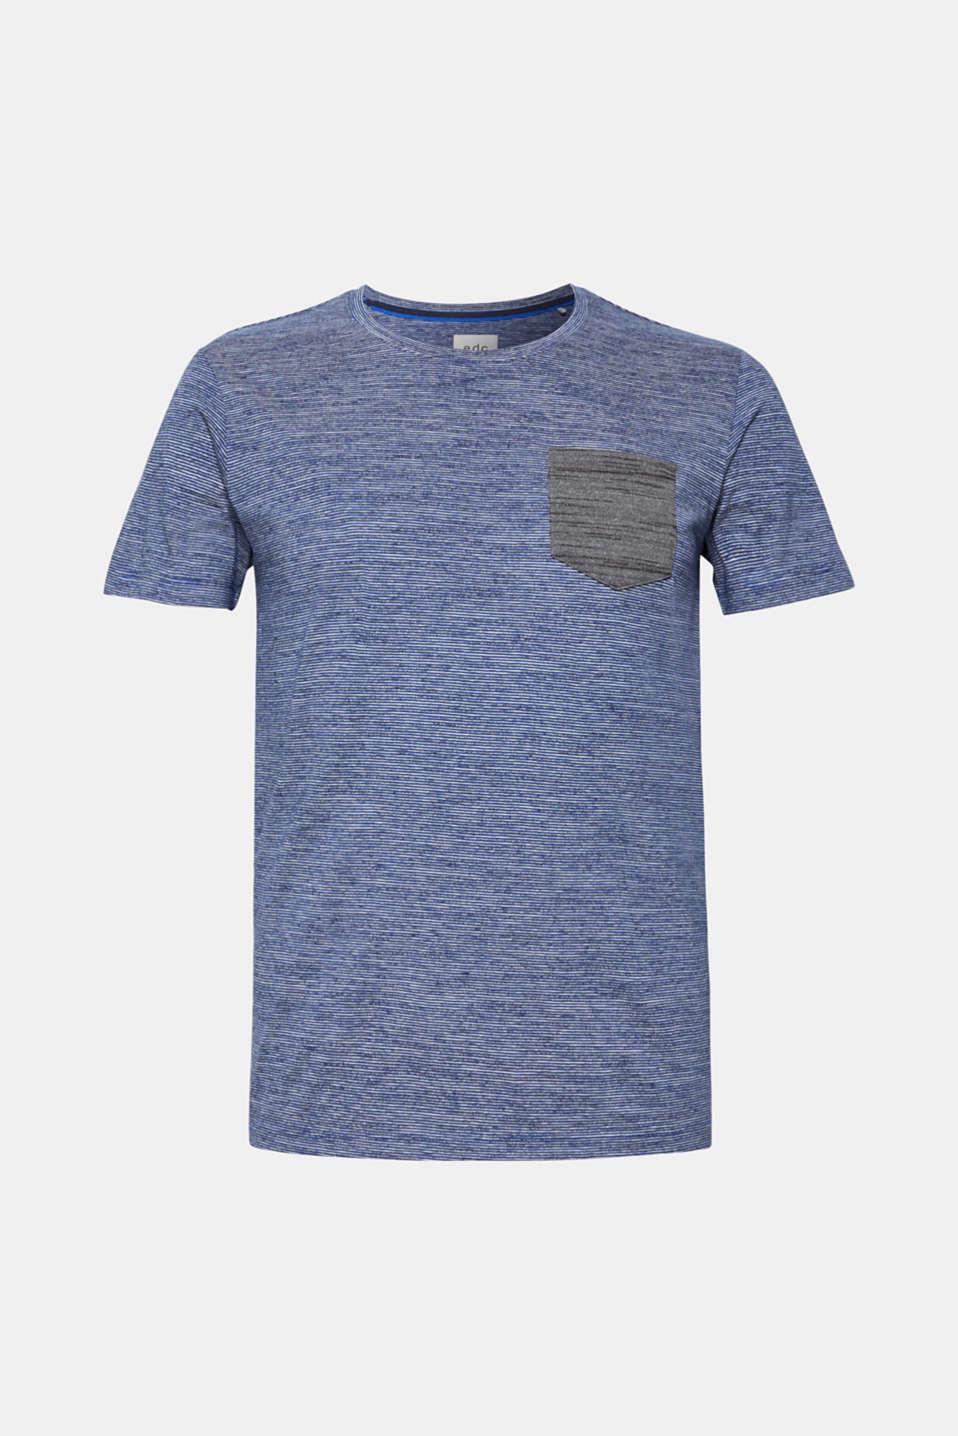 T-Shirts, BLUE, detail image number 6